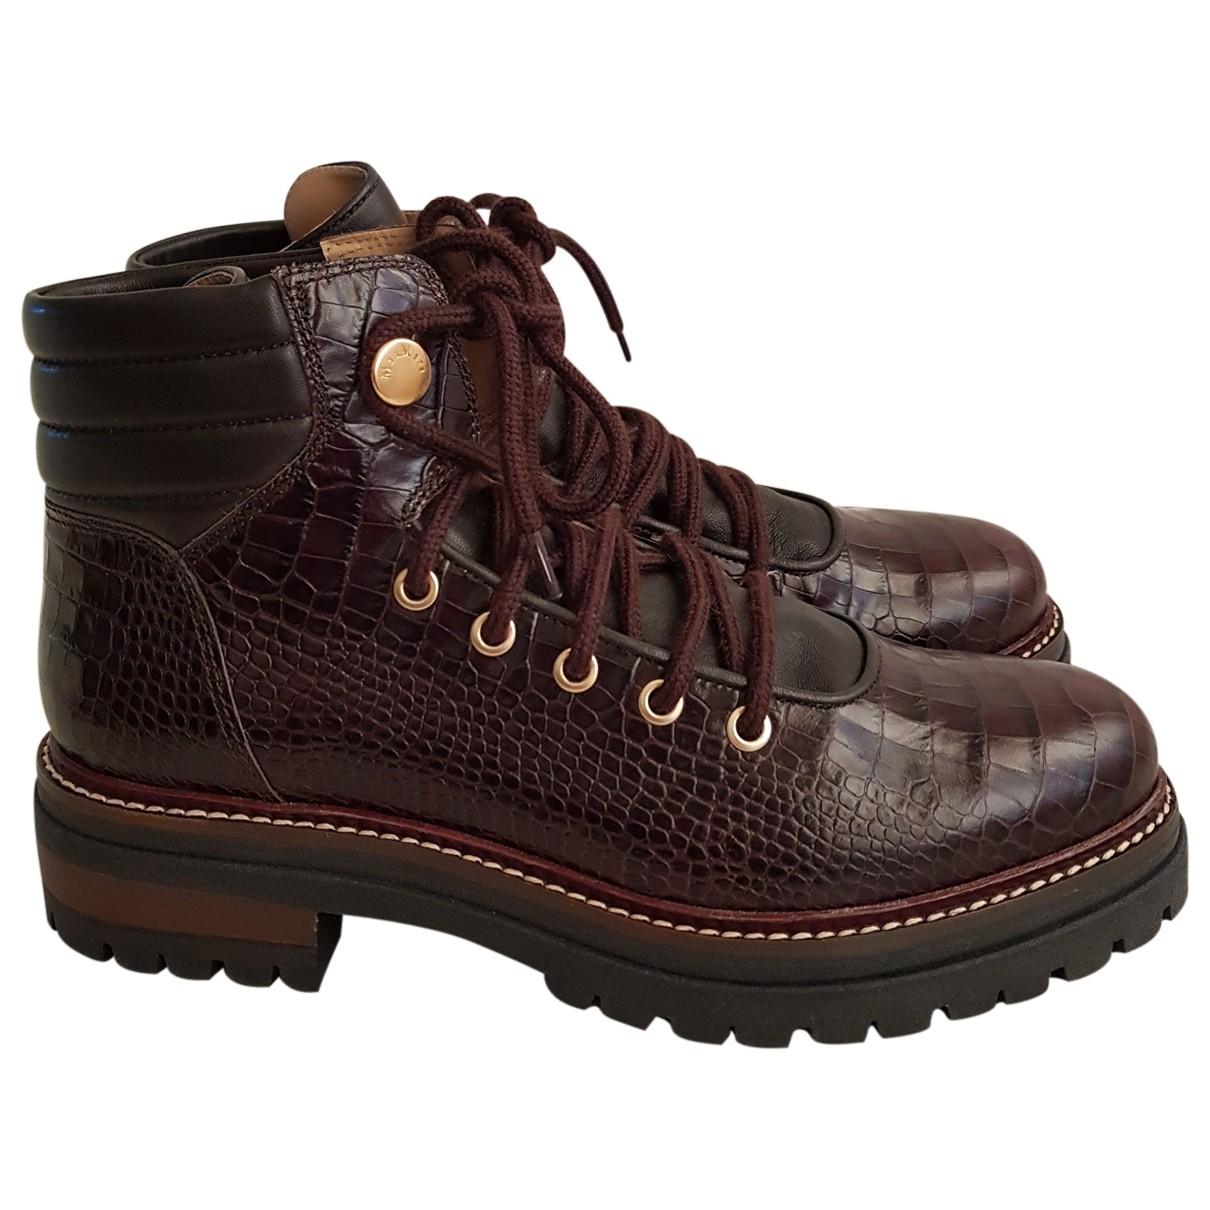 Max Mara - Boots   pour femme en cuir - marron